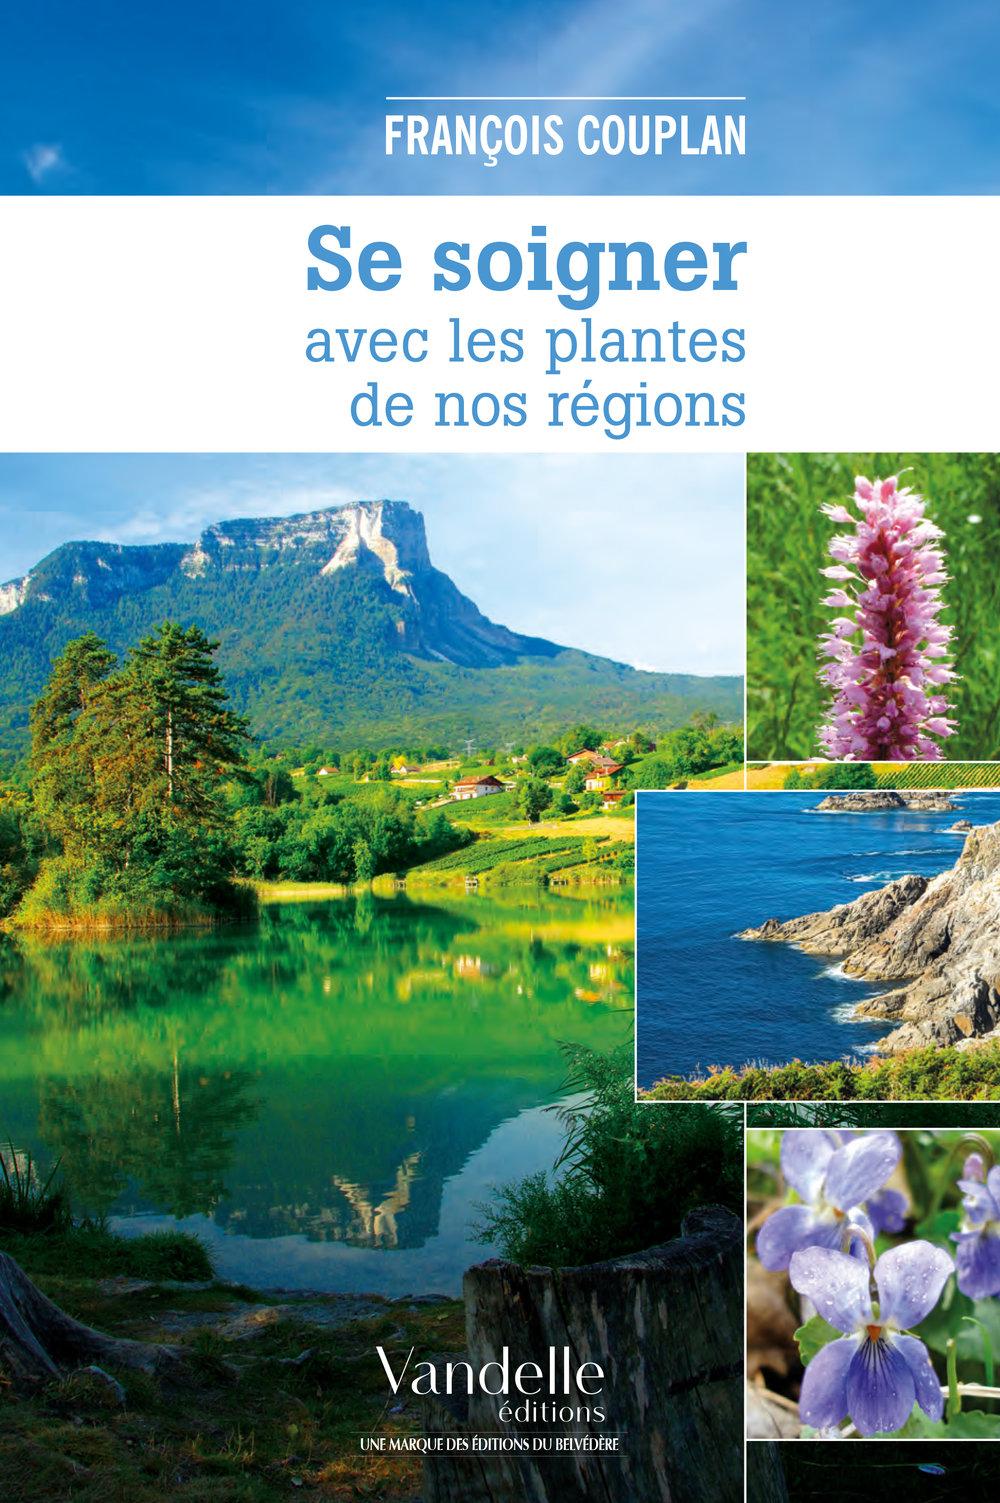 sesoigne-PlantesRegions.jpg